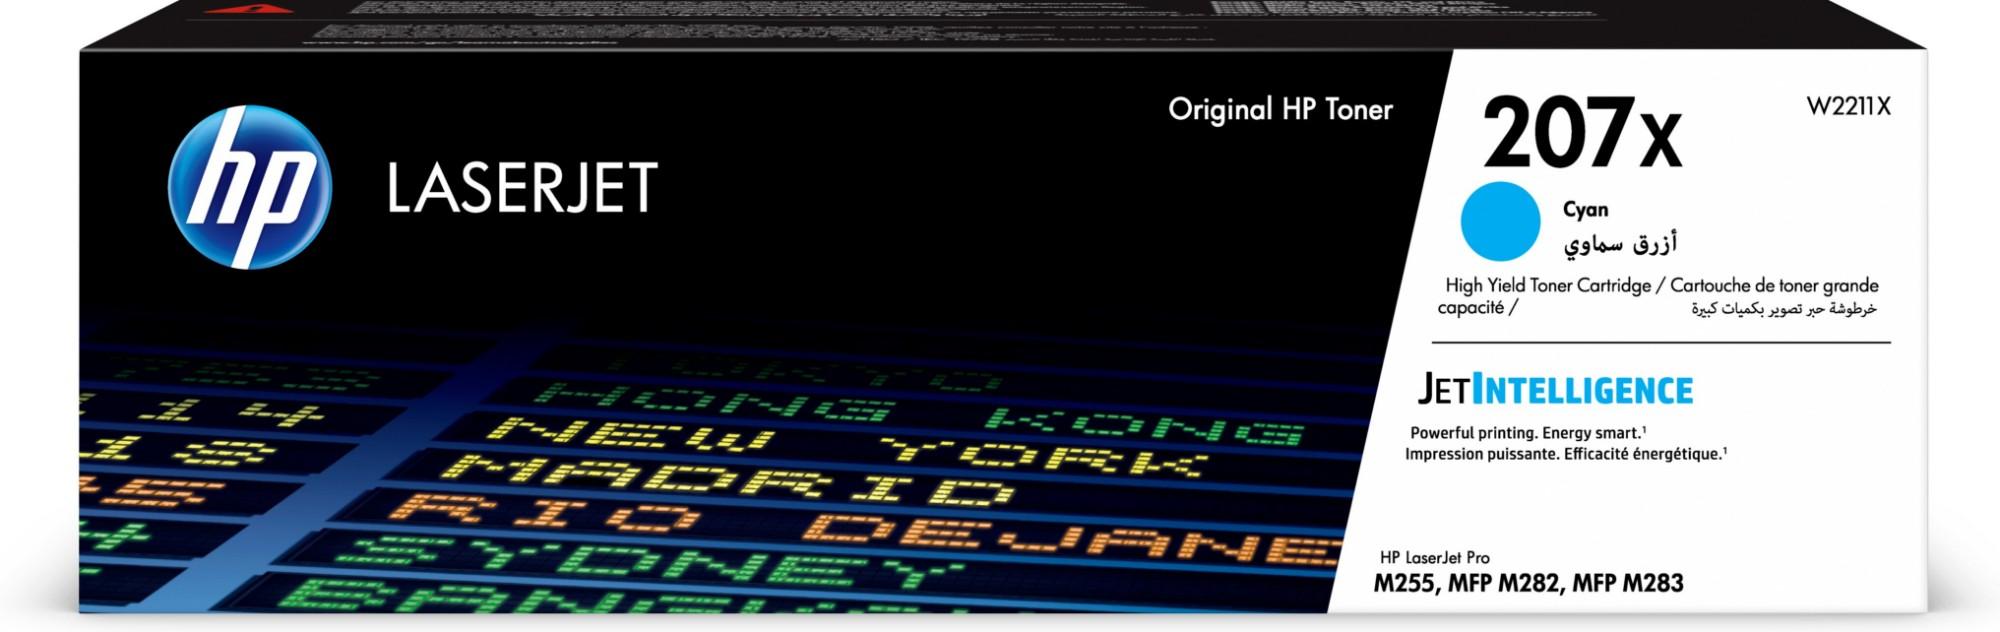 HP W2211X (207X) Toner cyan, 2.45K pages